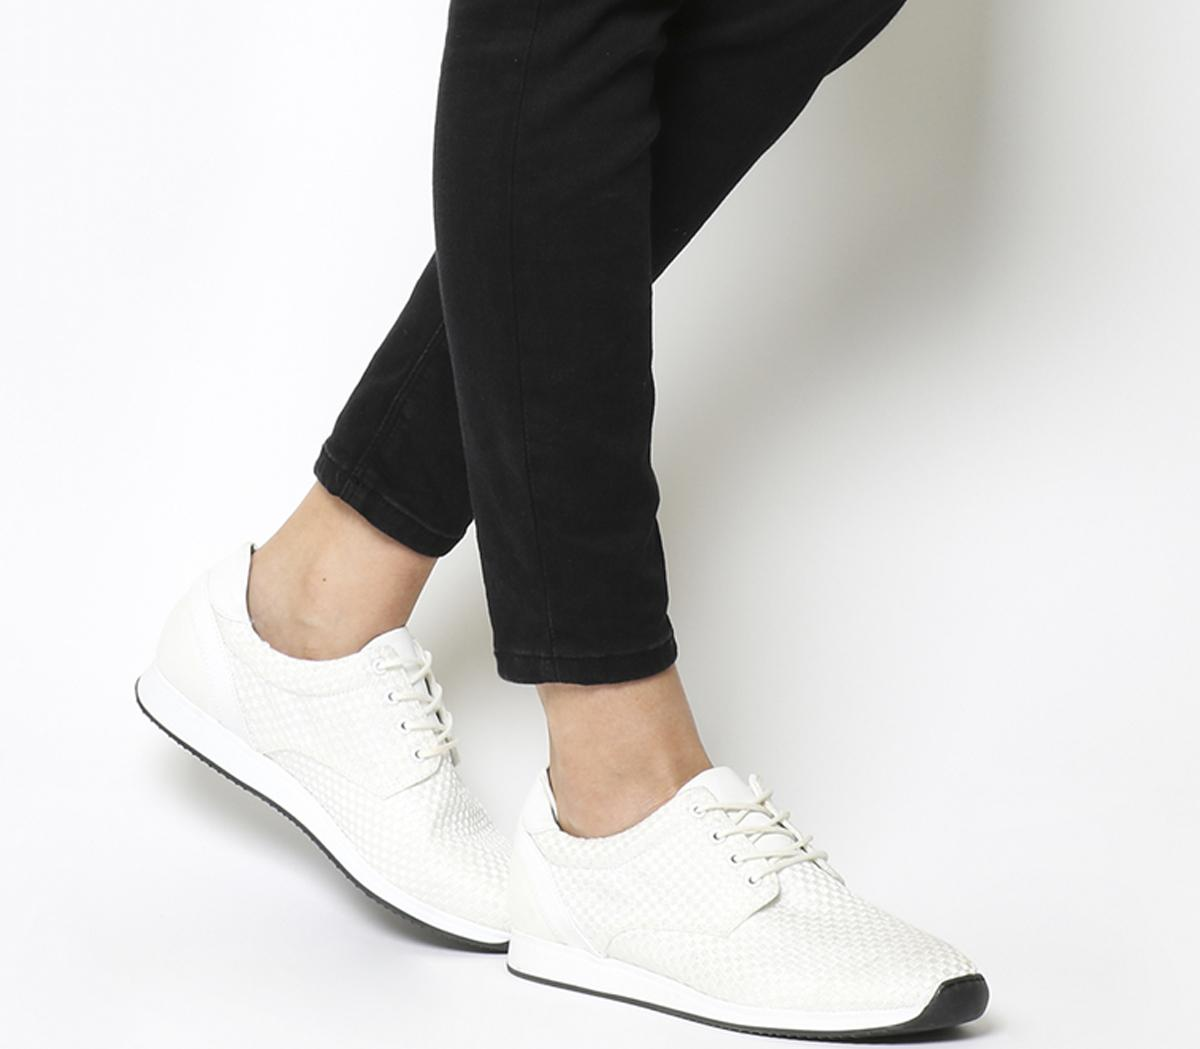 Vagabond Kasai Sneaker White - Flats